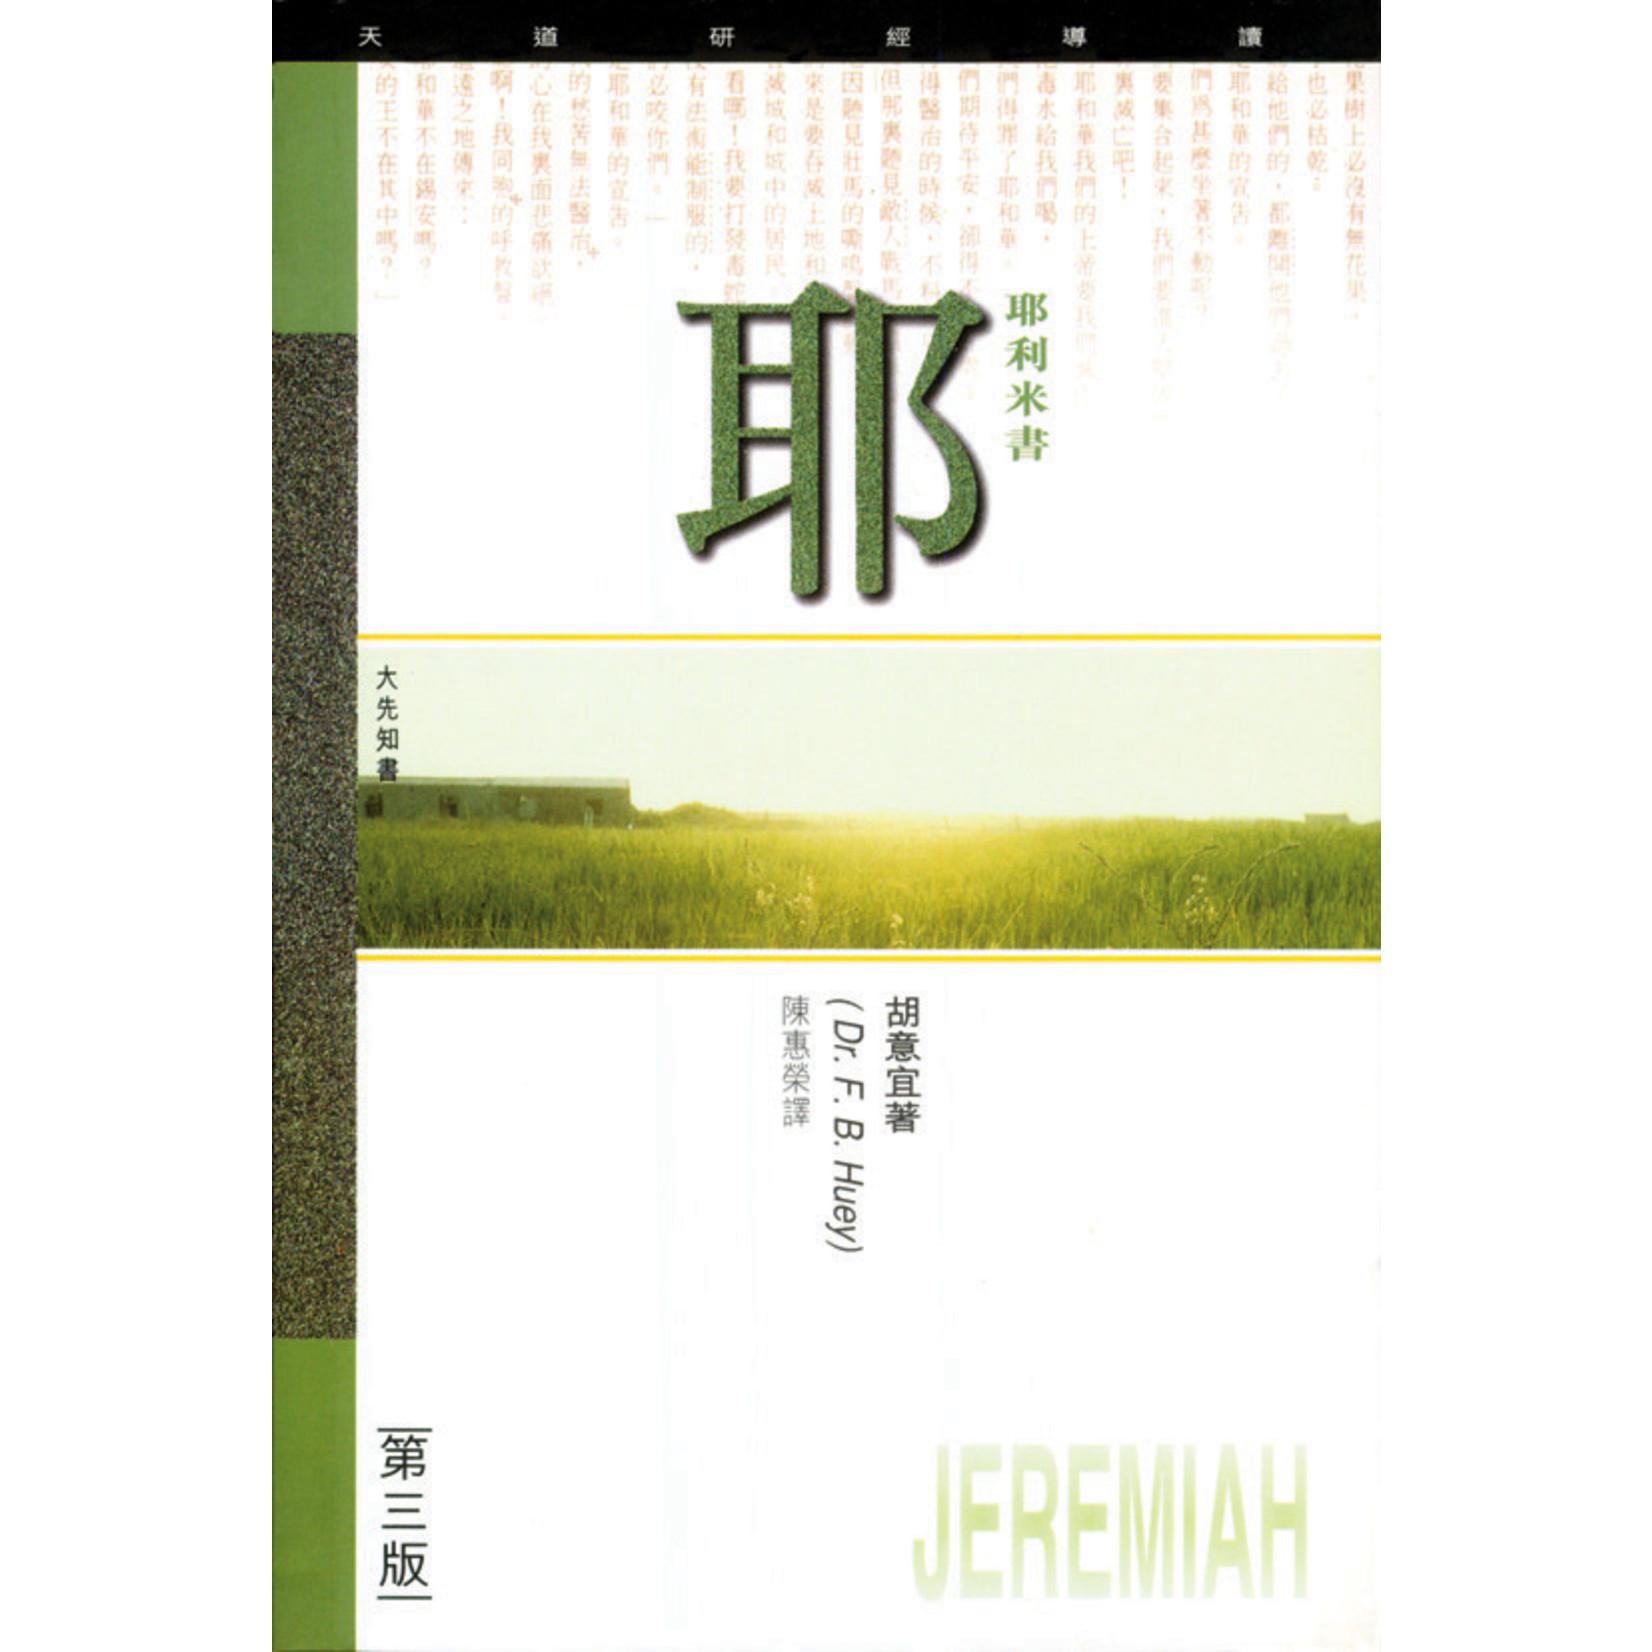 天道書樓 Tien Dao Publishing House 天道研經導讀:耶利米書